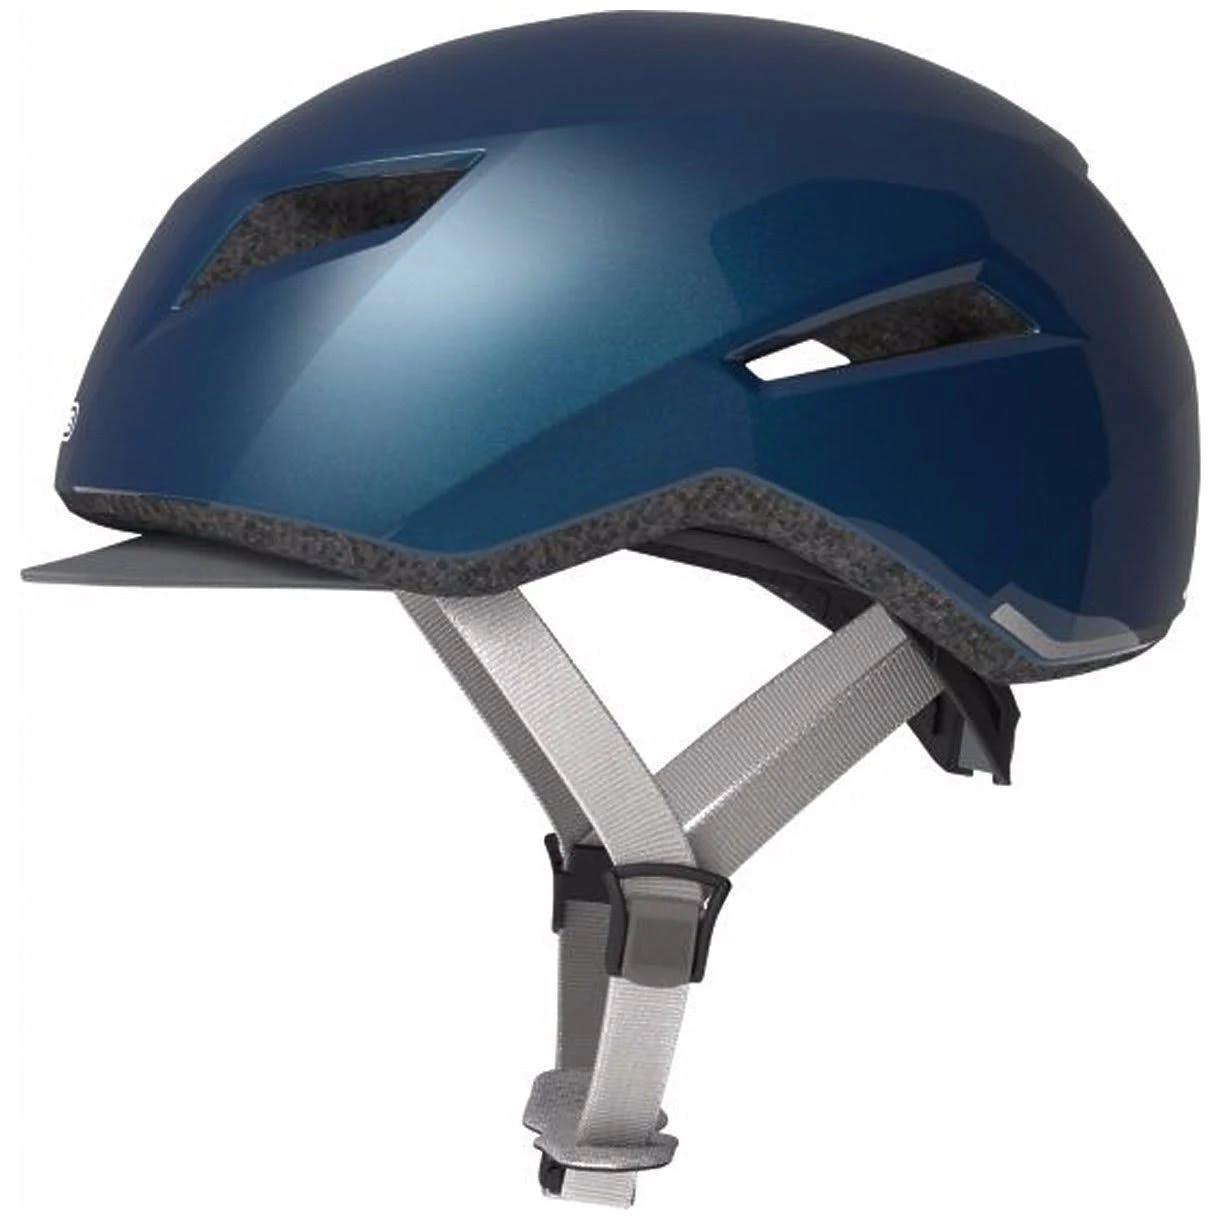 Abus Yadd-I Helmet Small / Midnight Blue